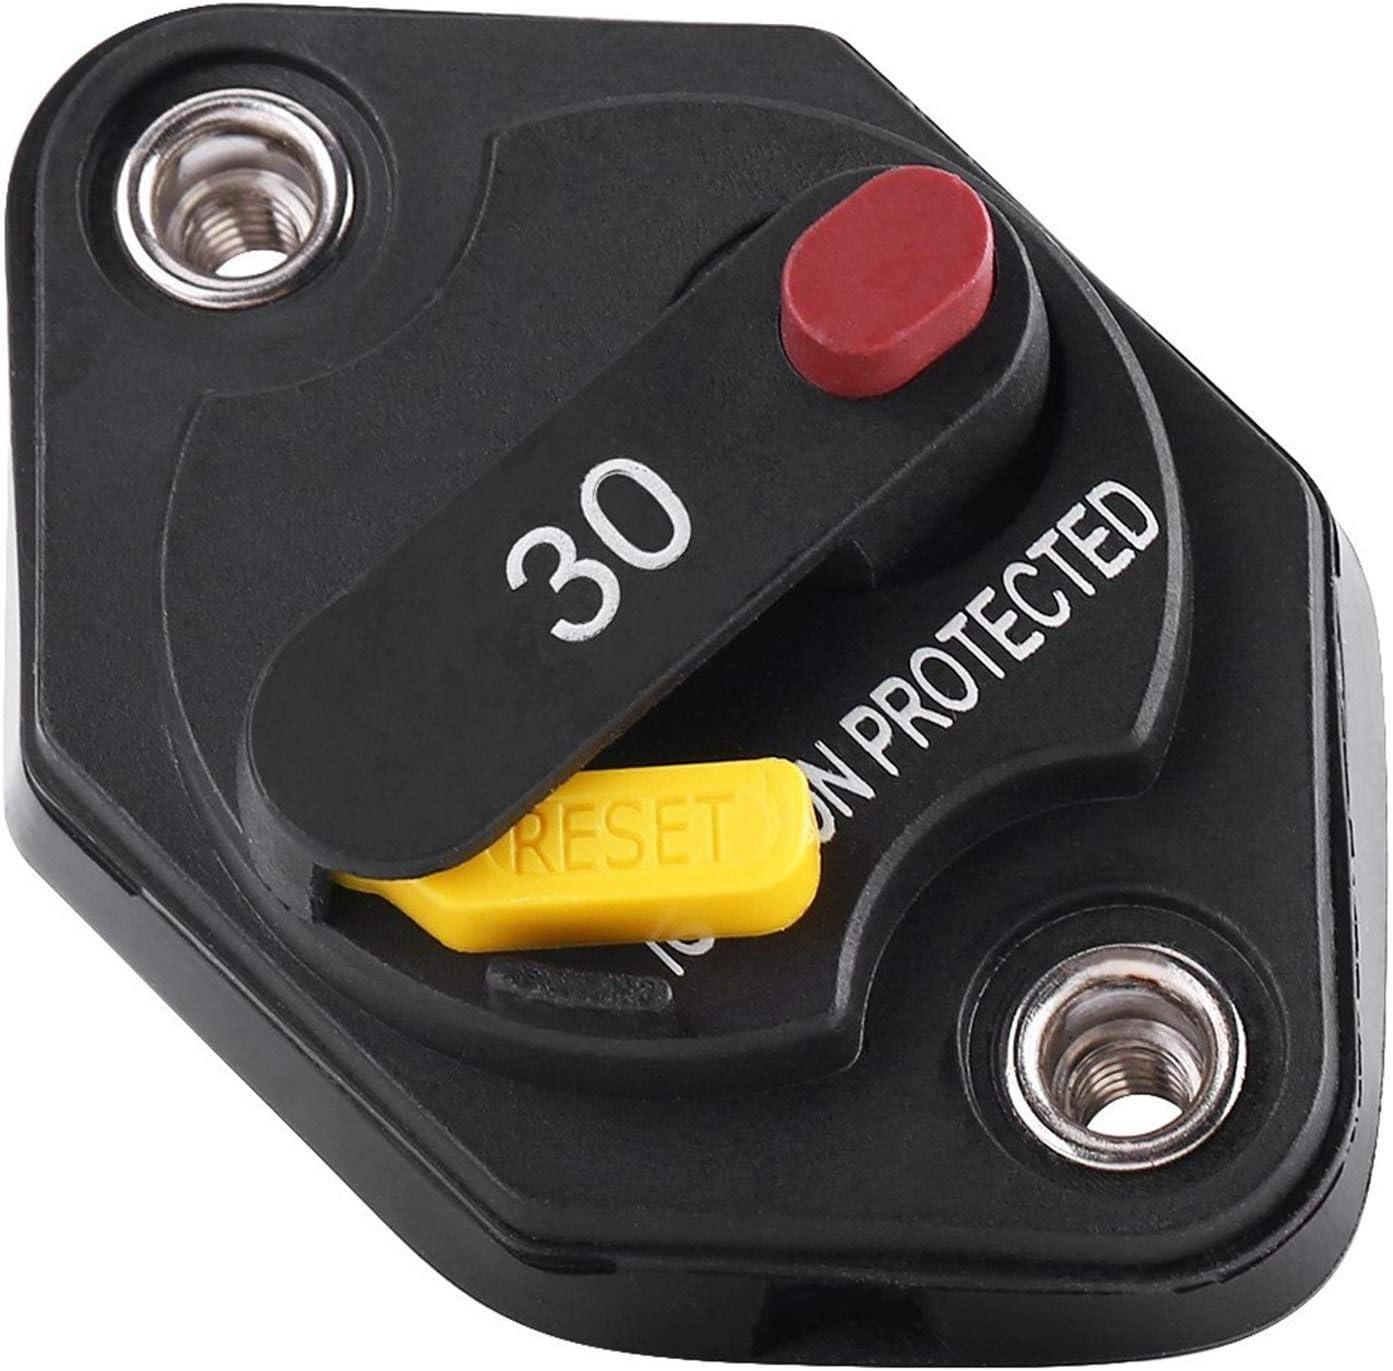 ZXC 1 Piece 30 Amp Waterproof Max 70% OFF Circuit Switc Manual Breaker Reset store